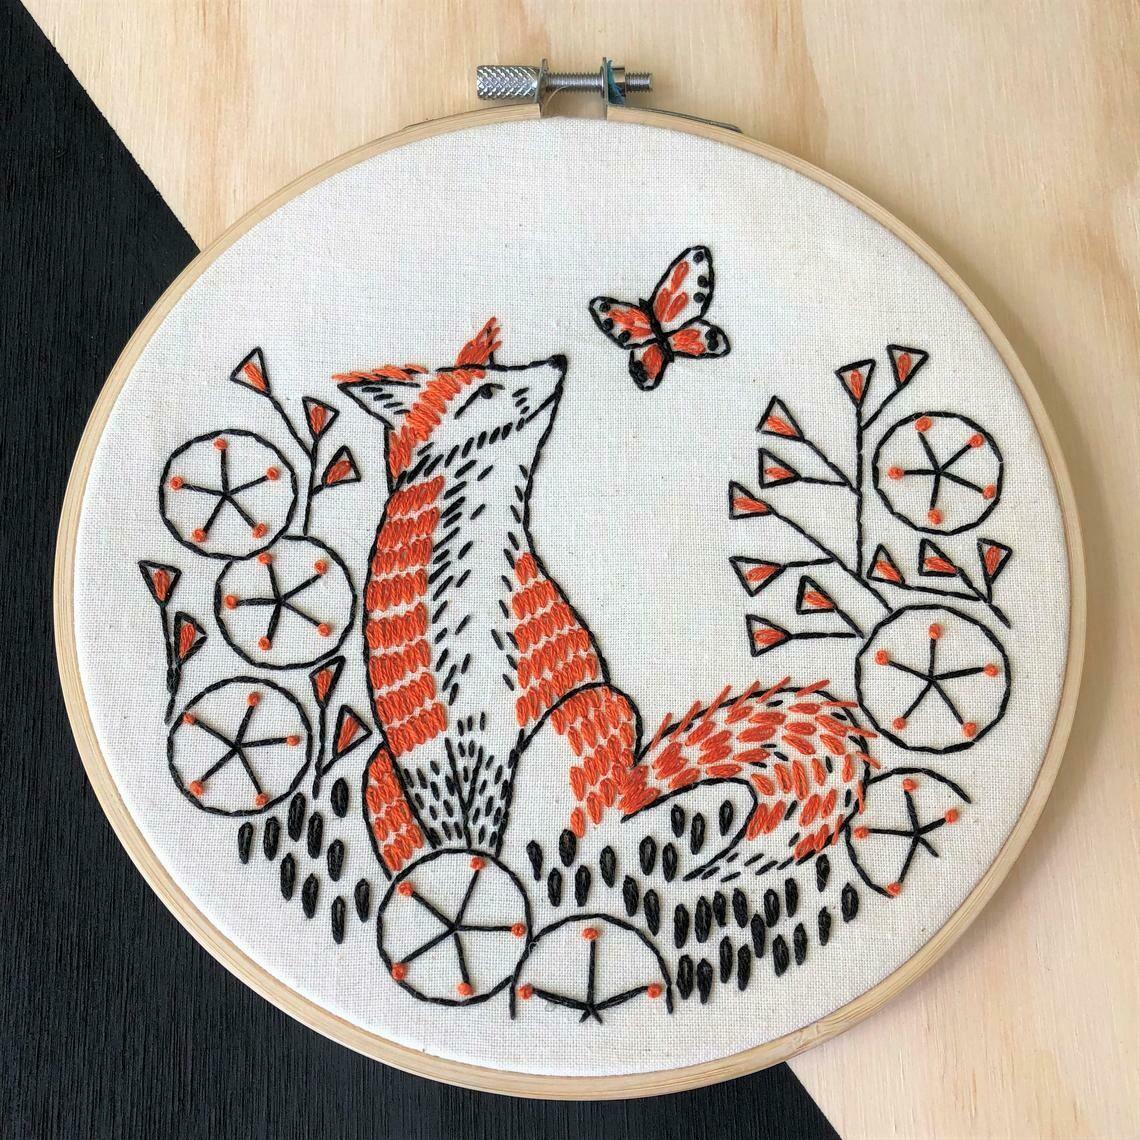 Hook Line & Tinker Fox in Phlox